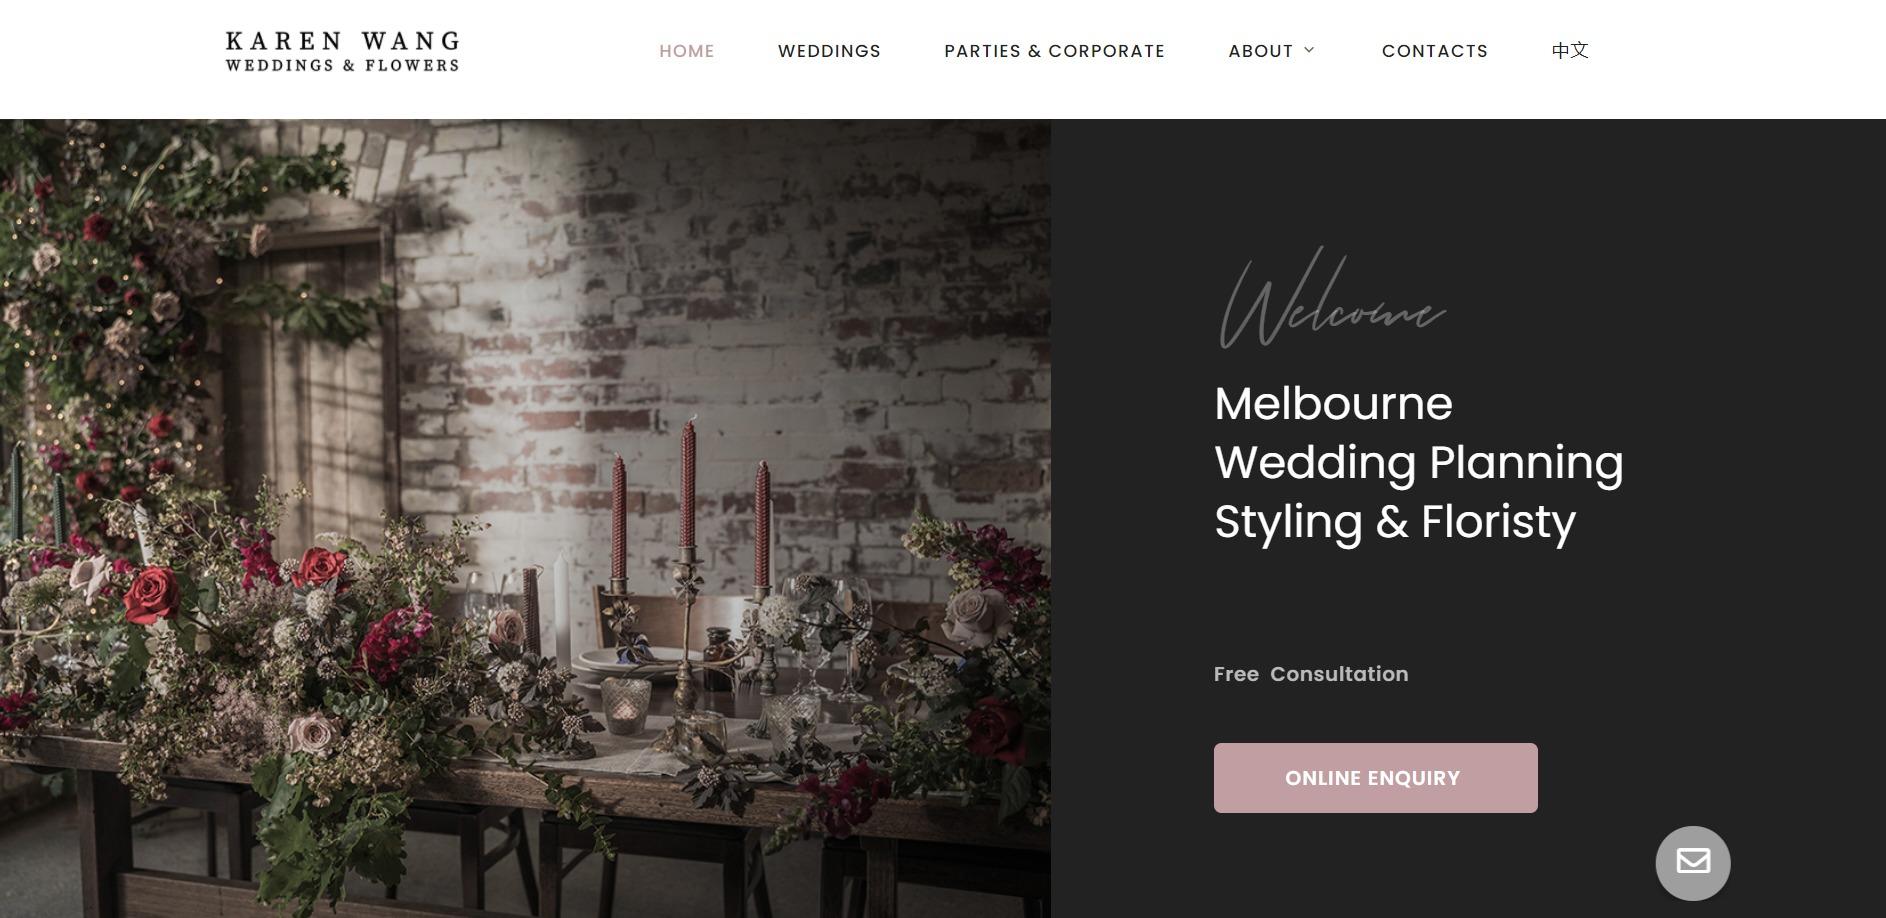 Karen Wang Weddings & Flowers